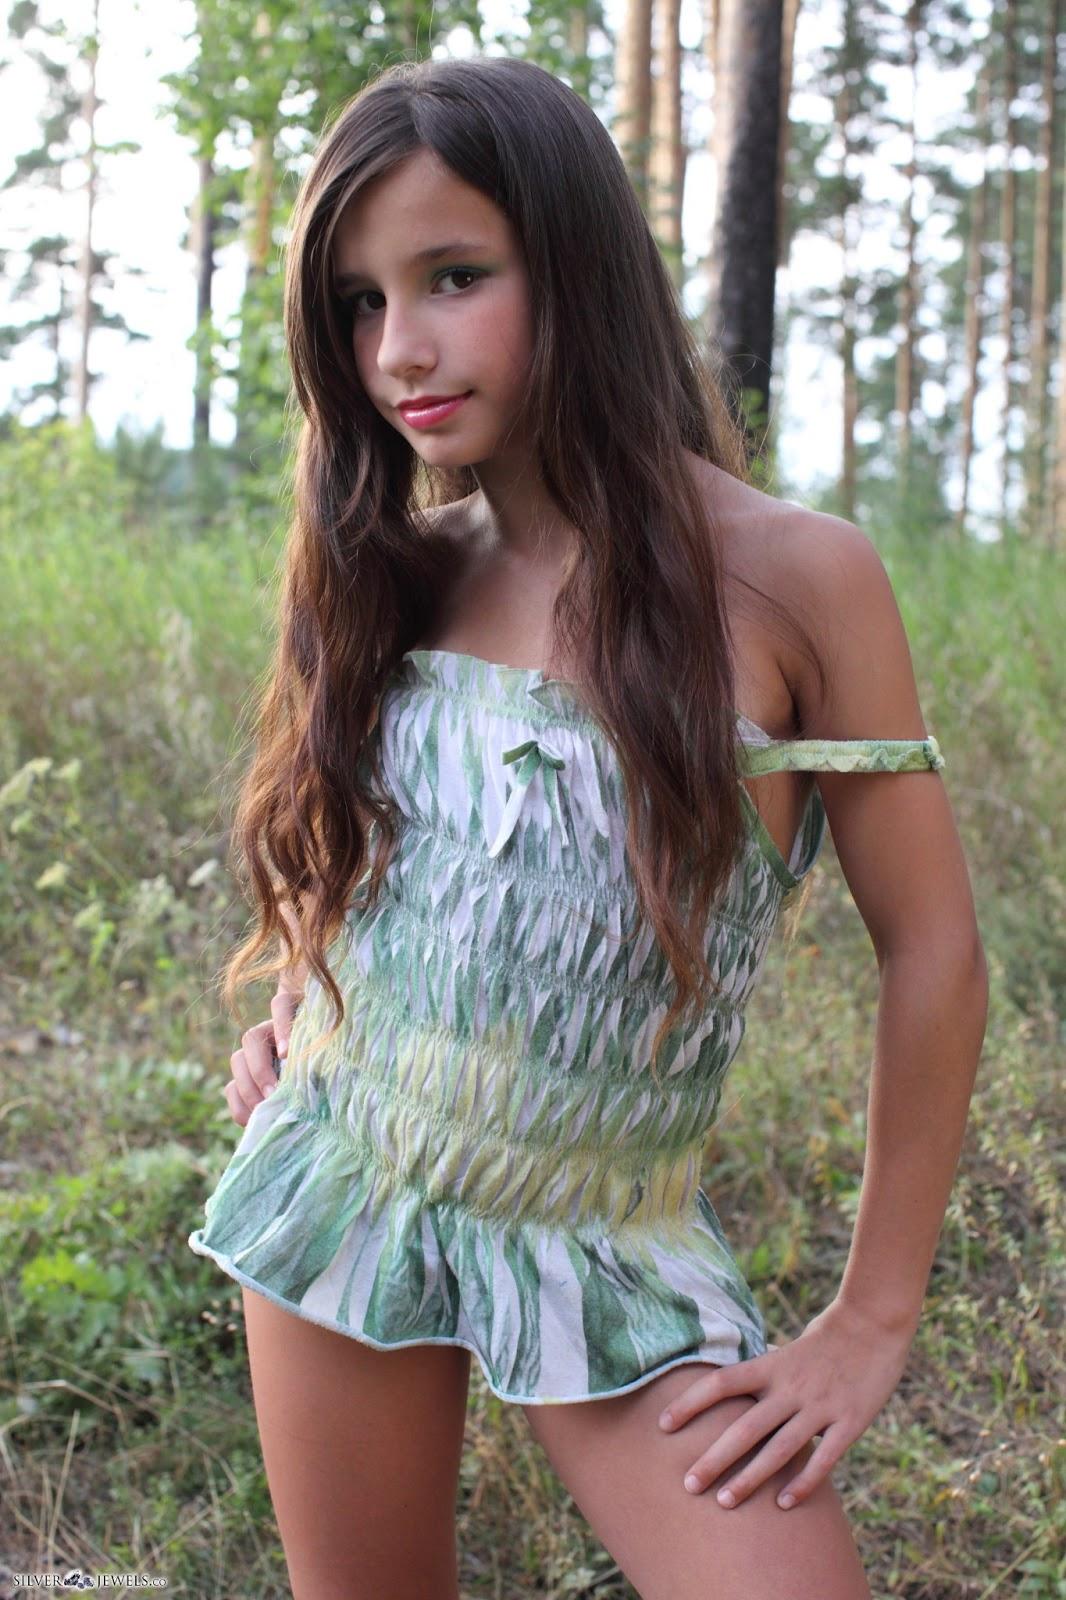 young girl teen model new star jpg 1080x810